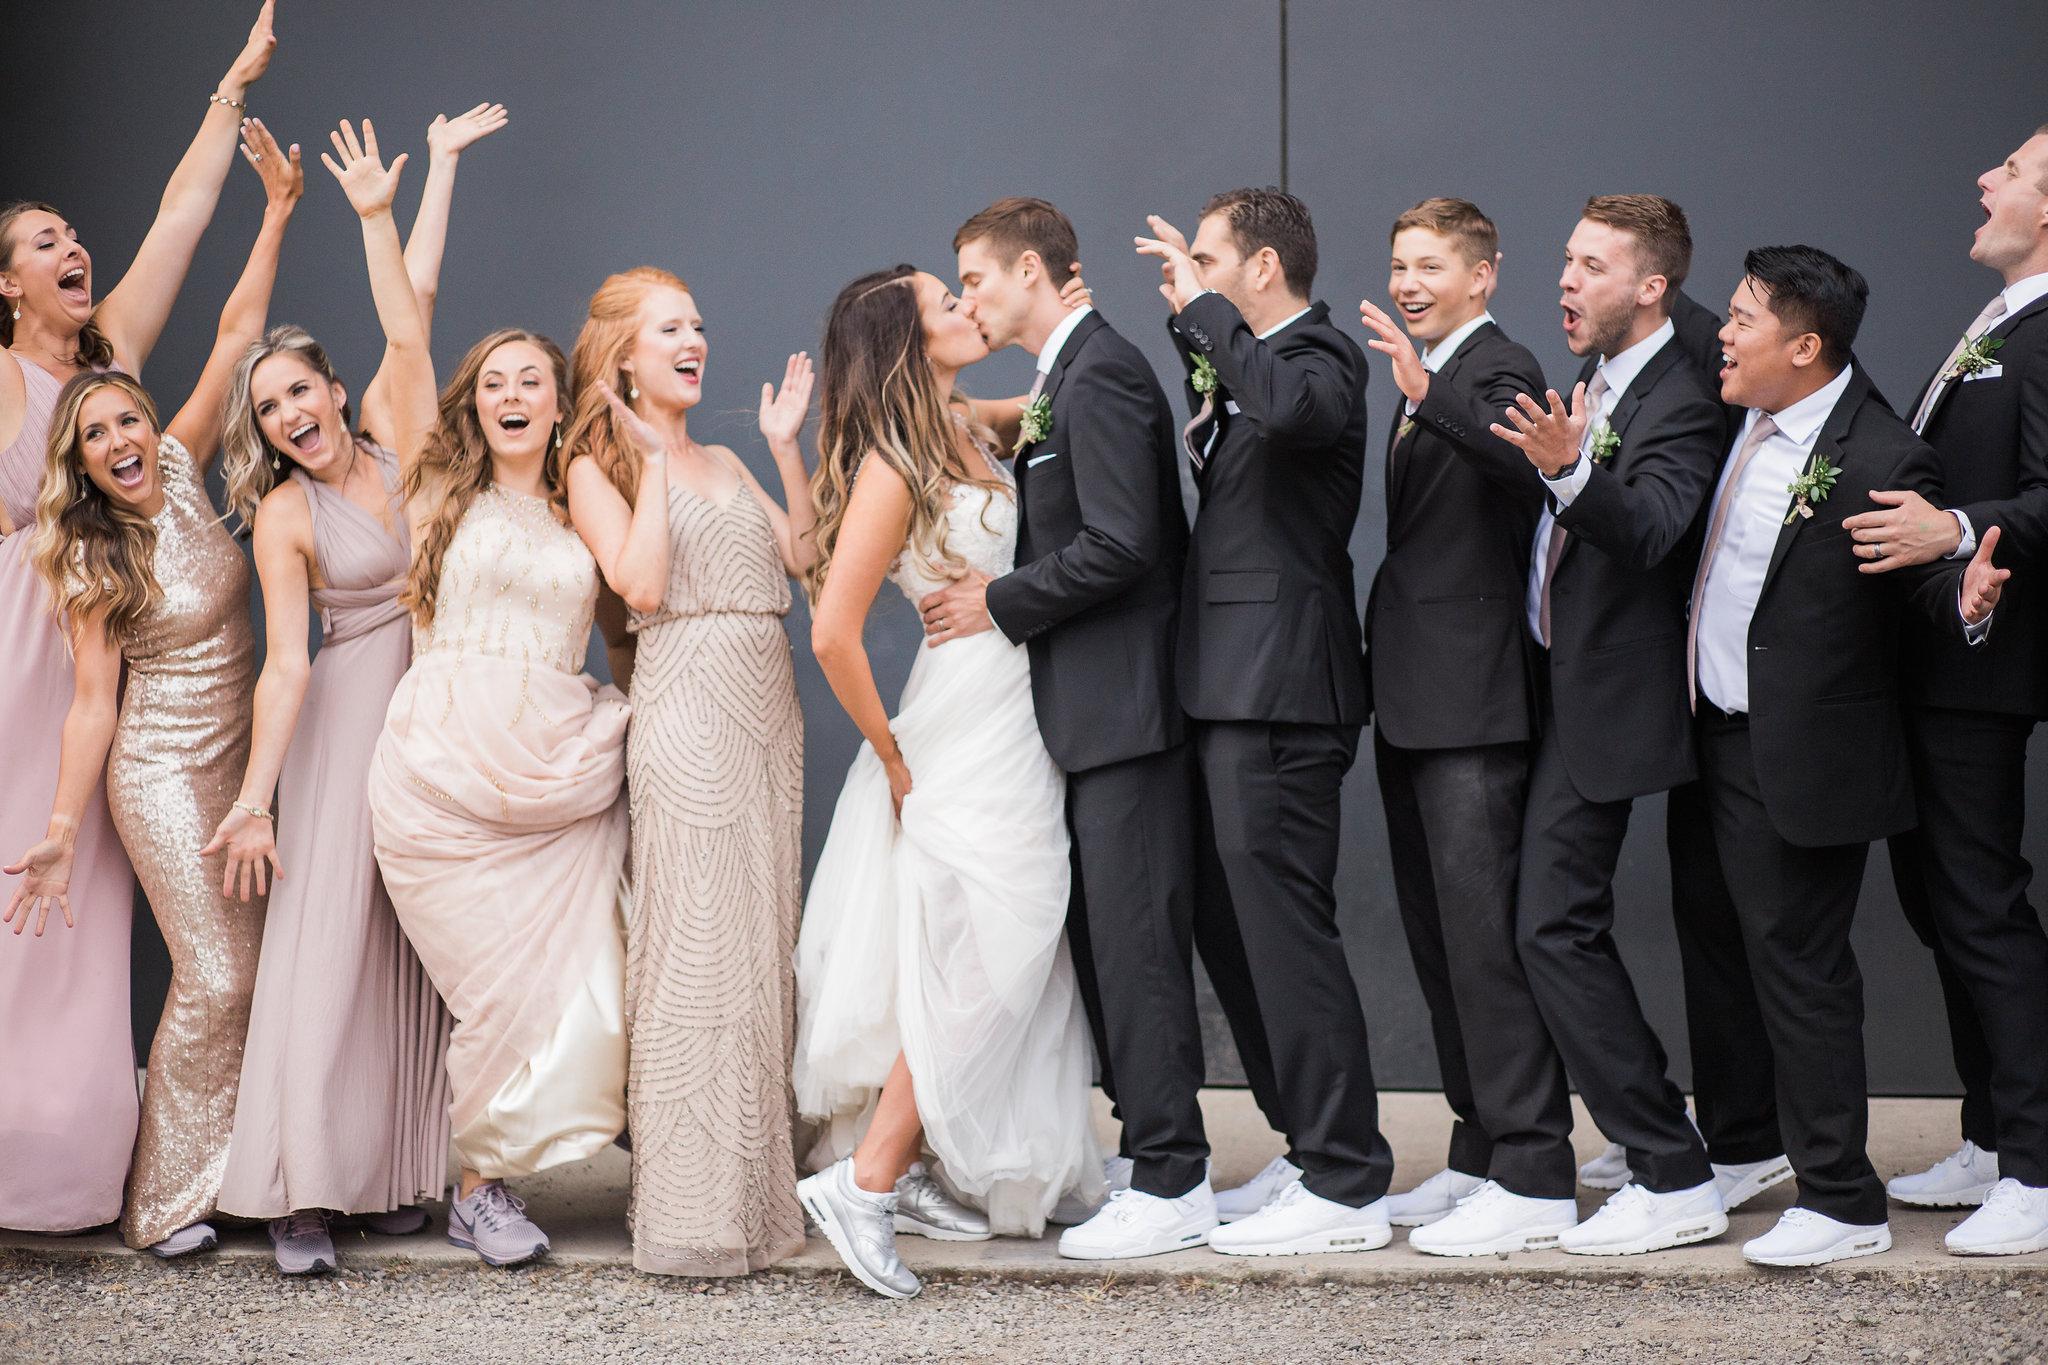 Bridalbliss.com | Portland Seattle Bend Wedding Planner | Oregon Washington Event Design | Alexandra Grace Photography